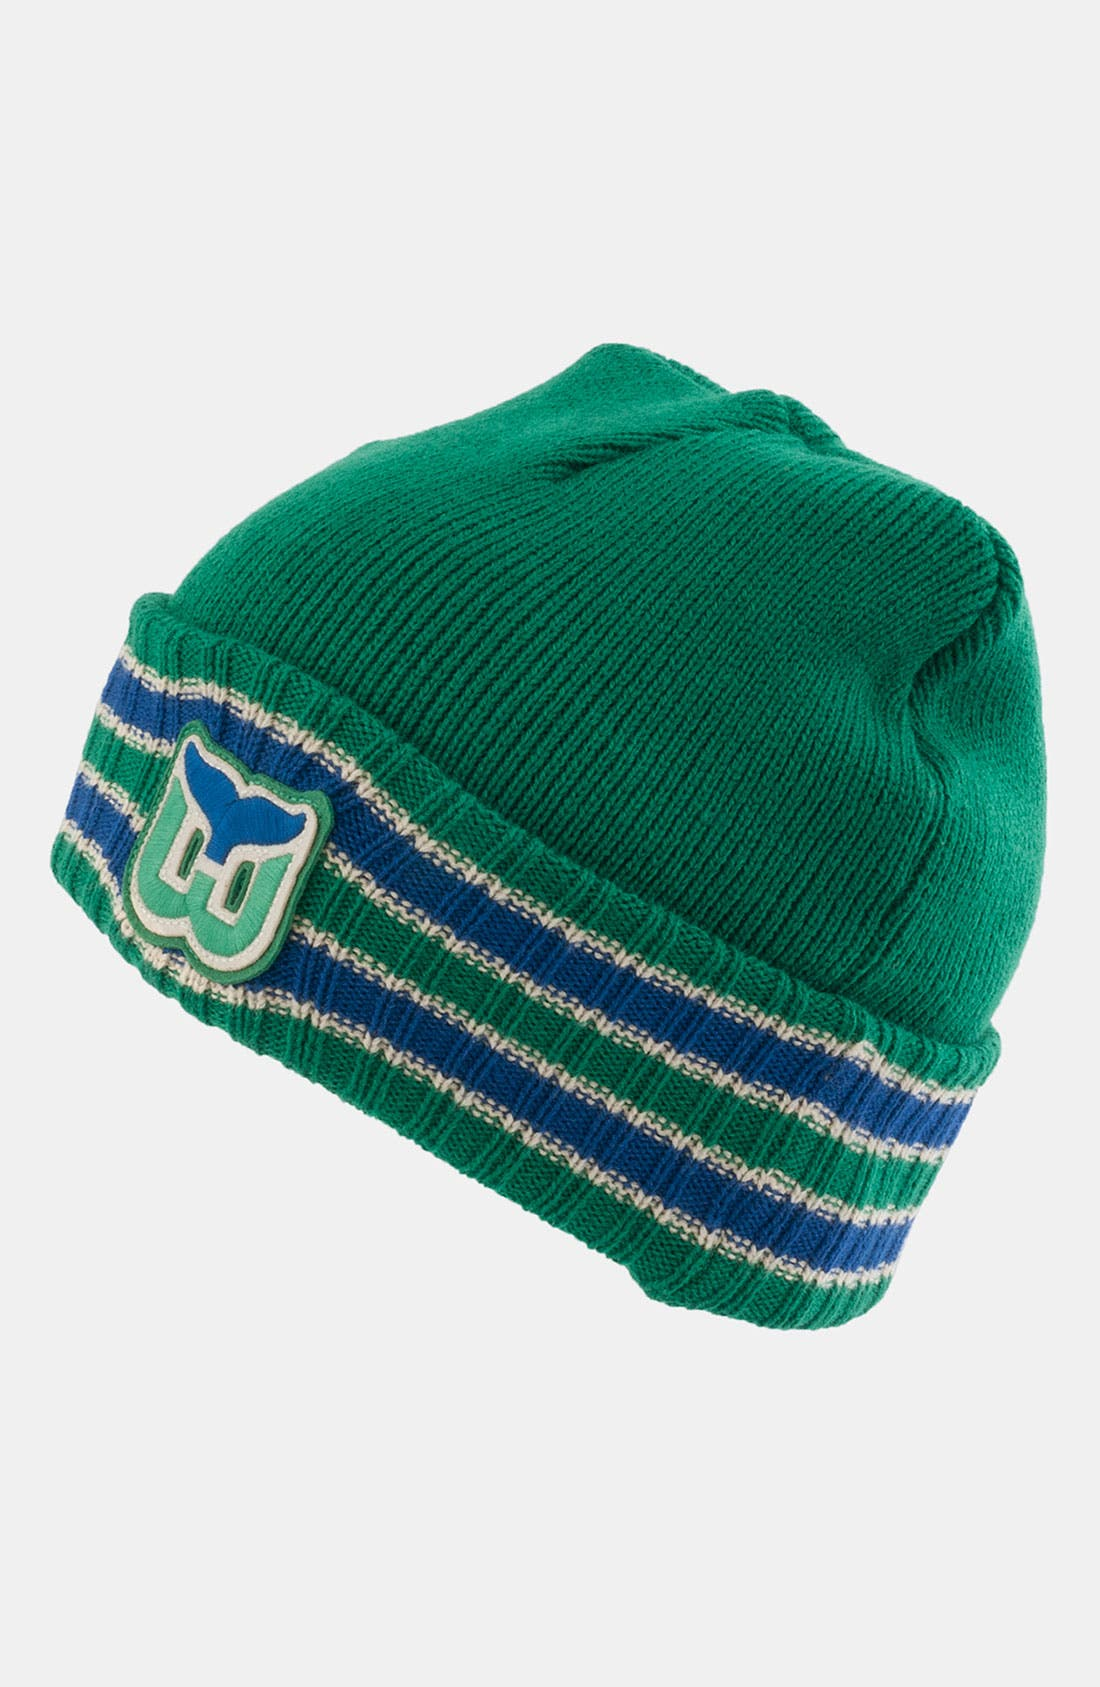 Main Image - American Needle 'Hartford Whalers - Slash' Knit Hat